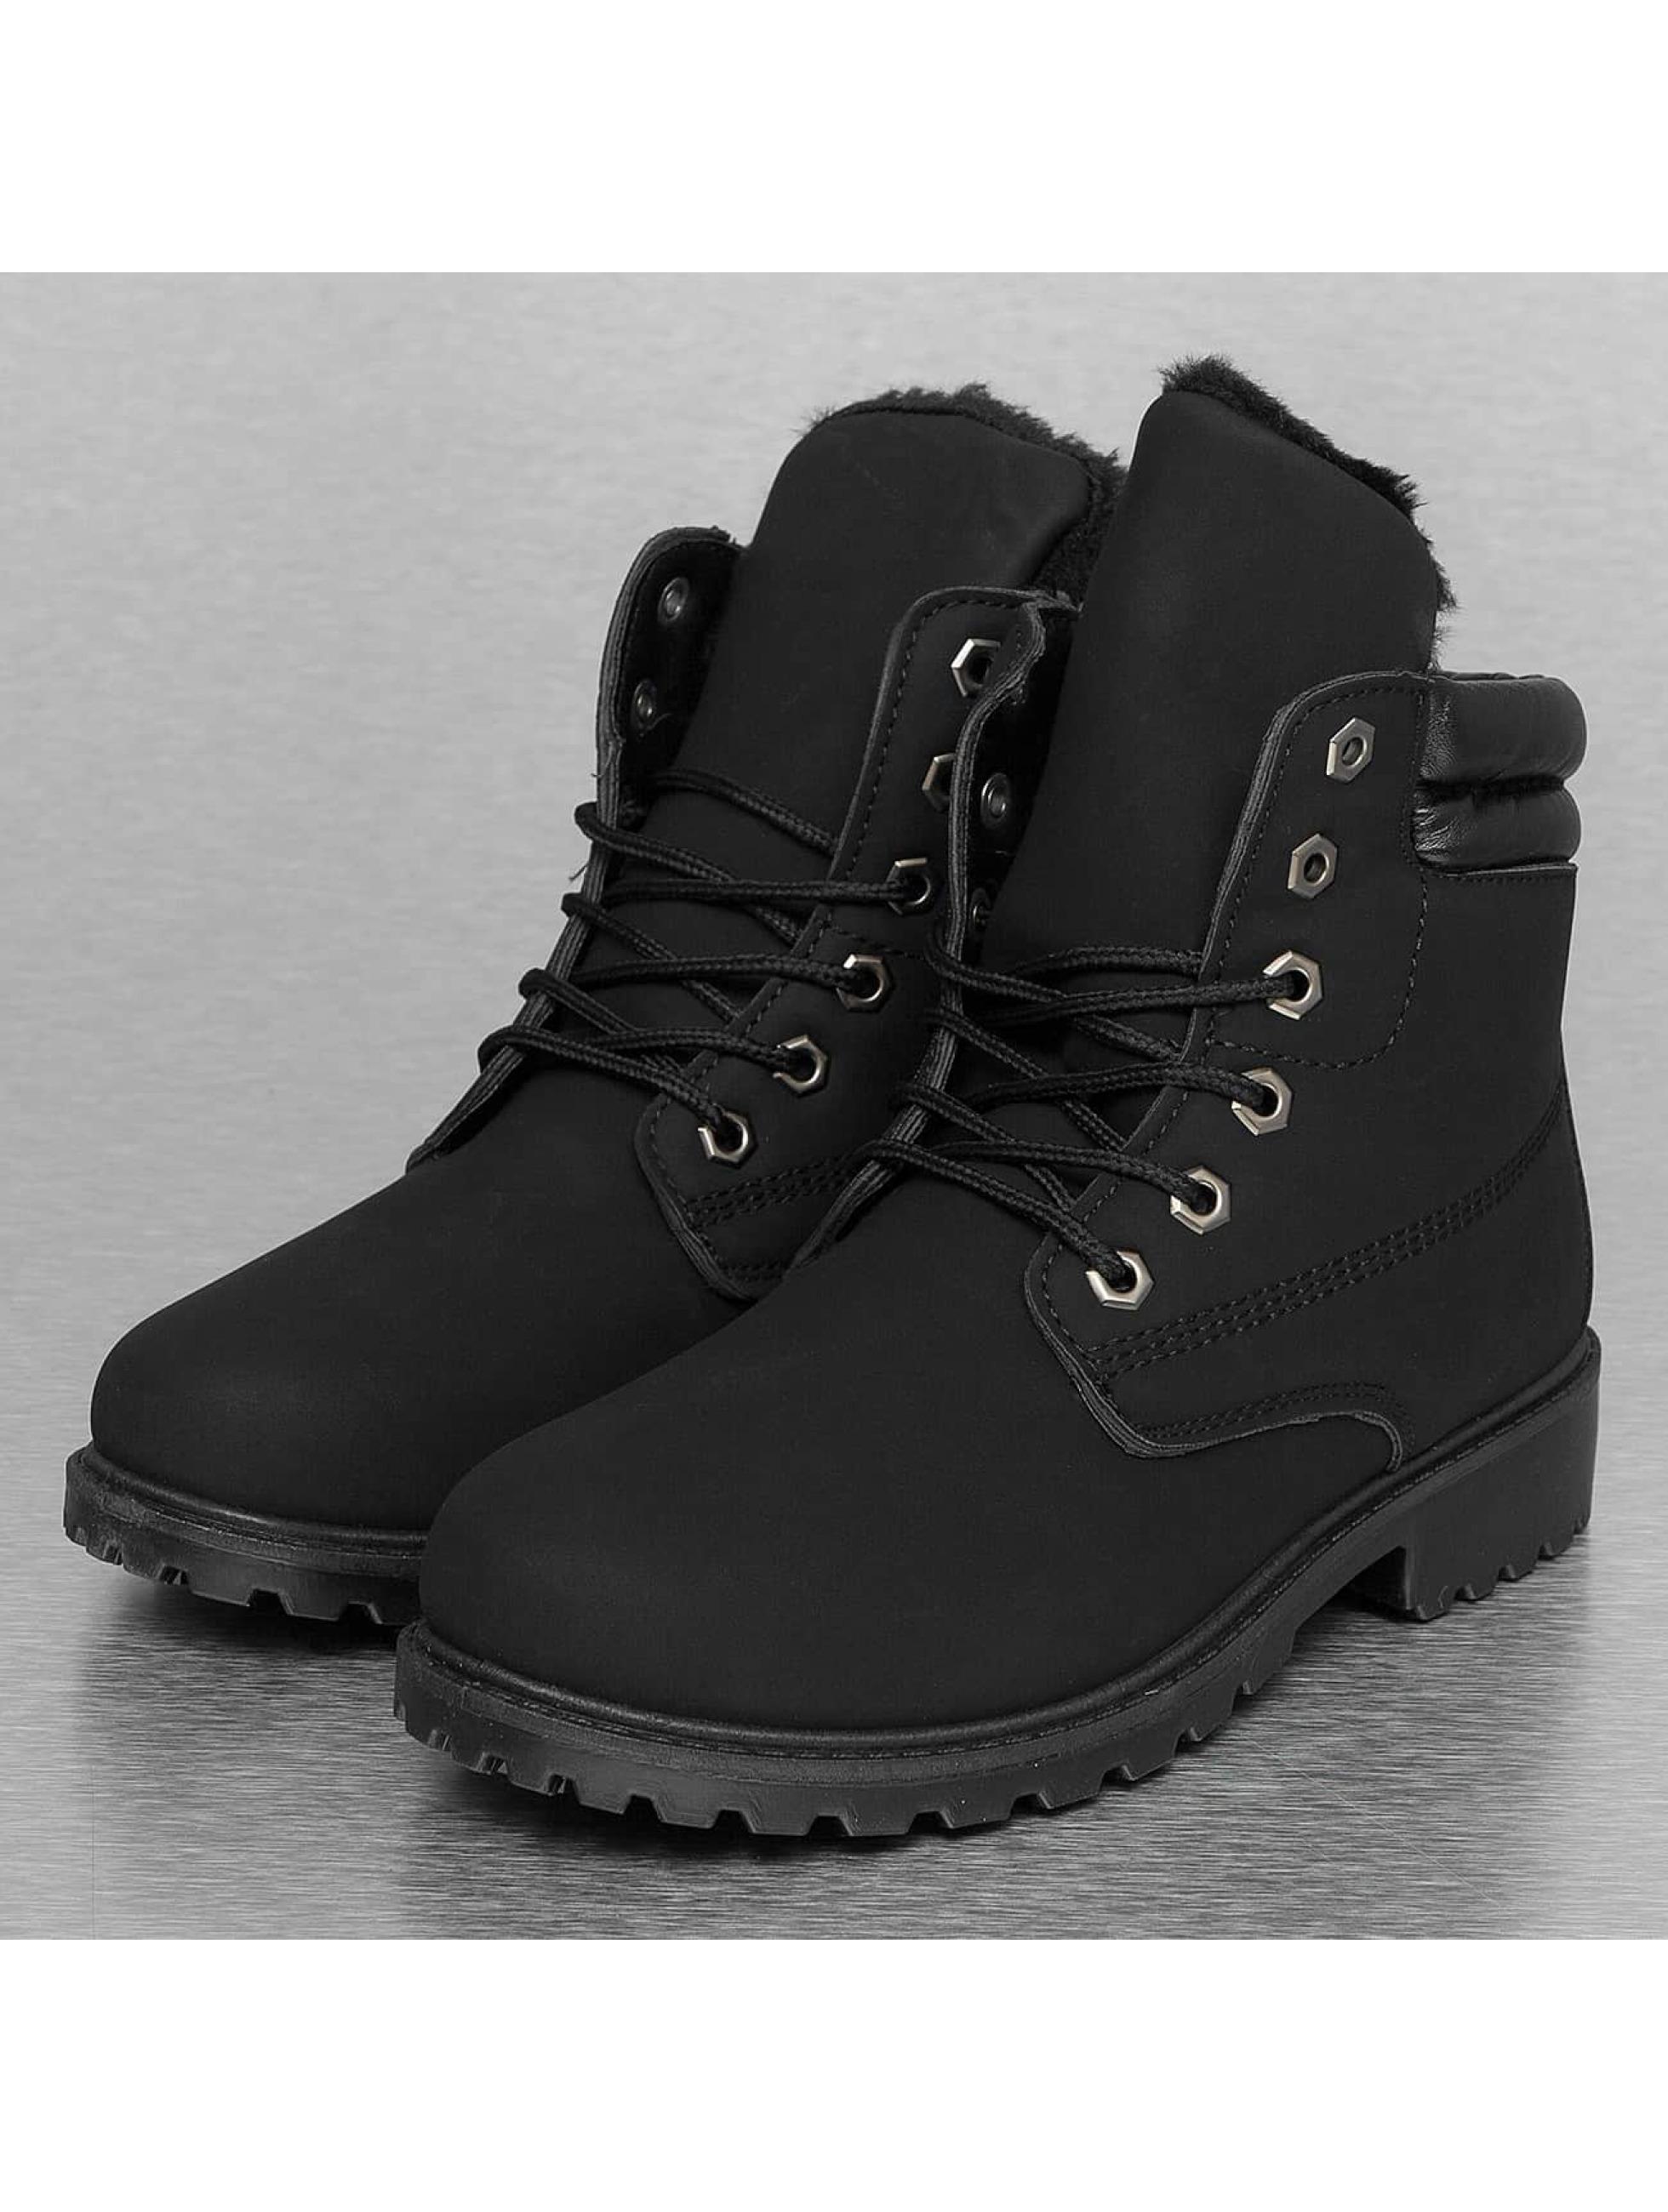 Jumex Chaussures / Chaussures montantes Basic en noir